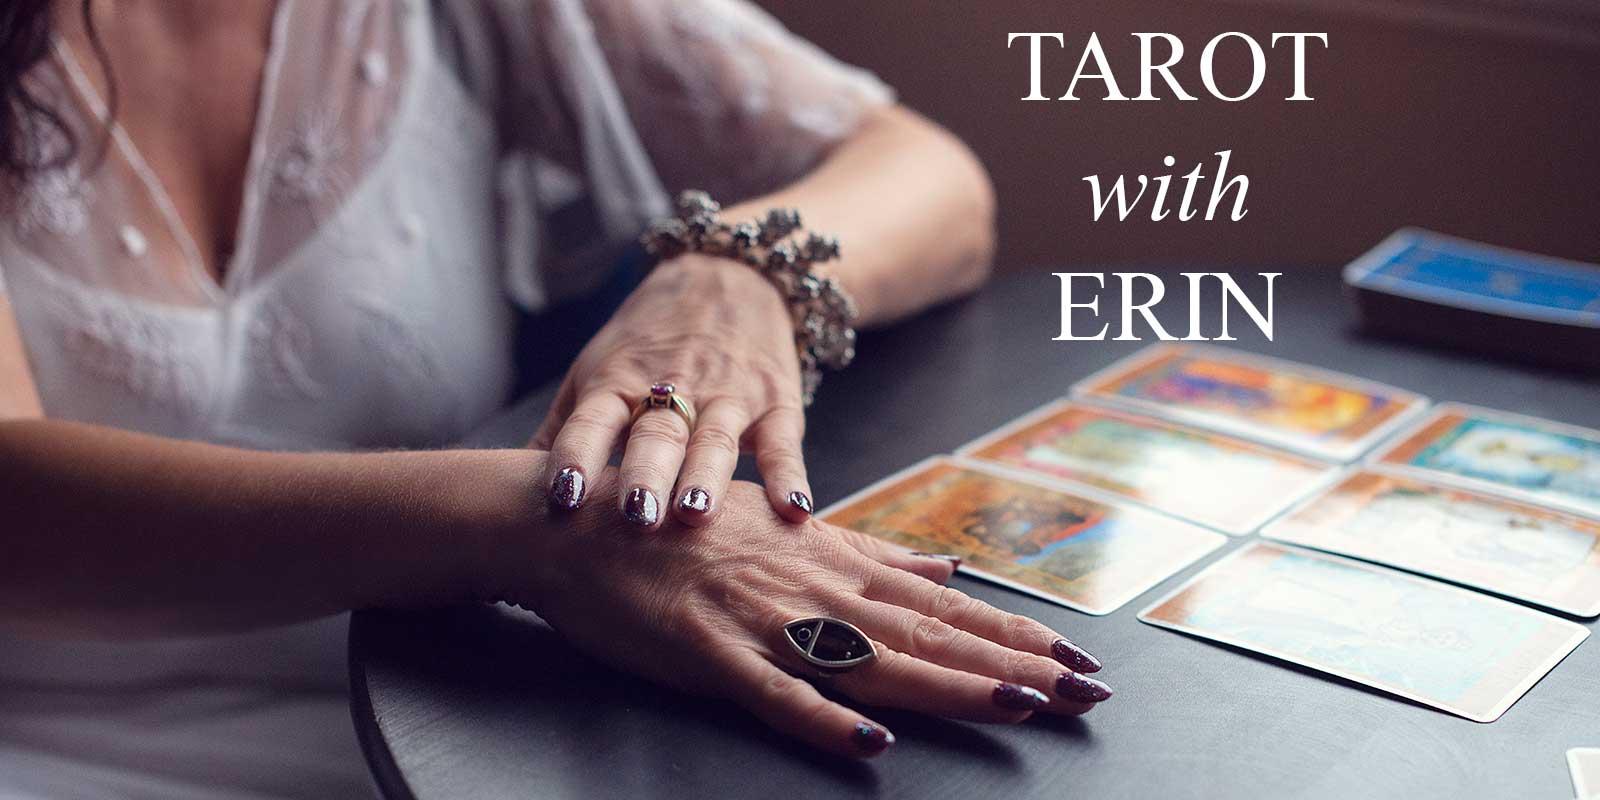 tarot-with-erin-butler-header-1600